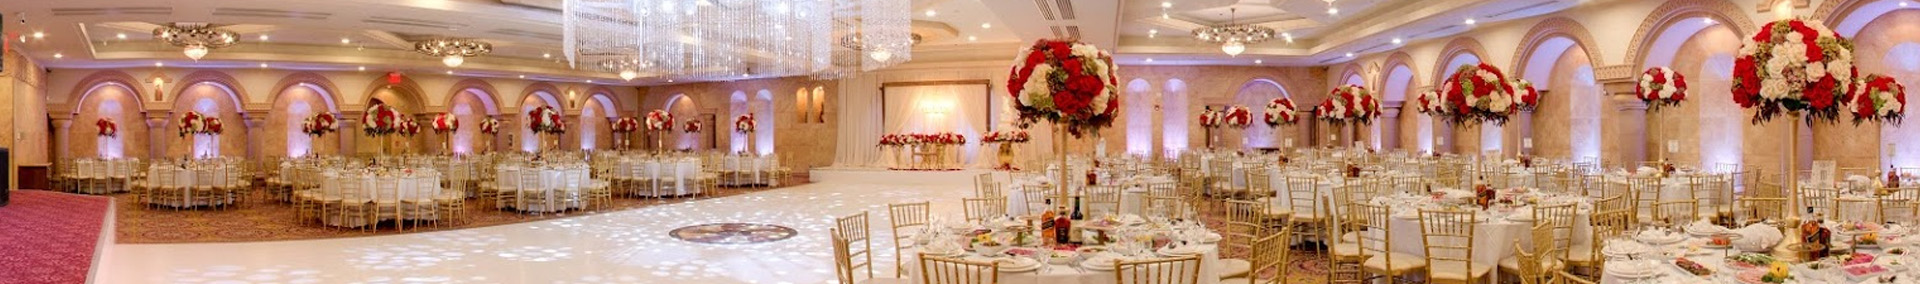 Panoramic of los angeles wedding venue